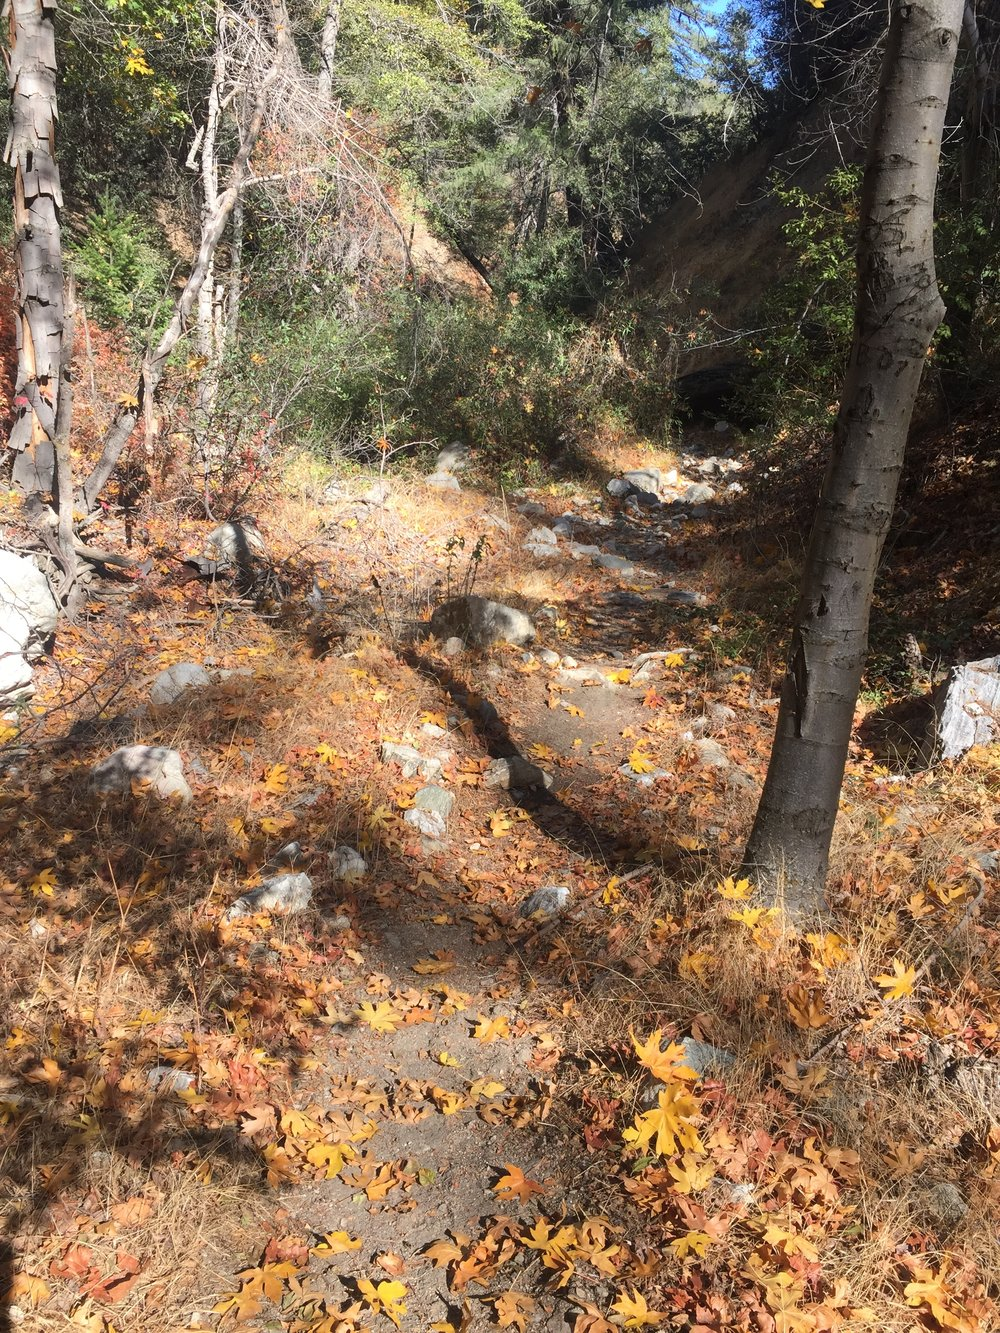 It's definitely fall in Shake Canyon